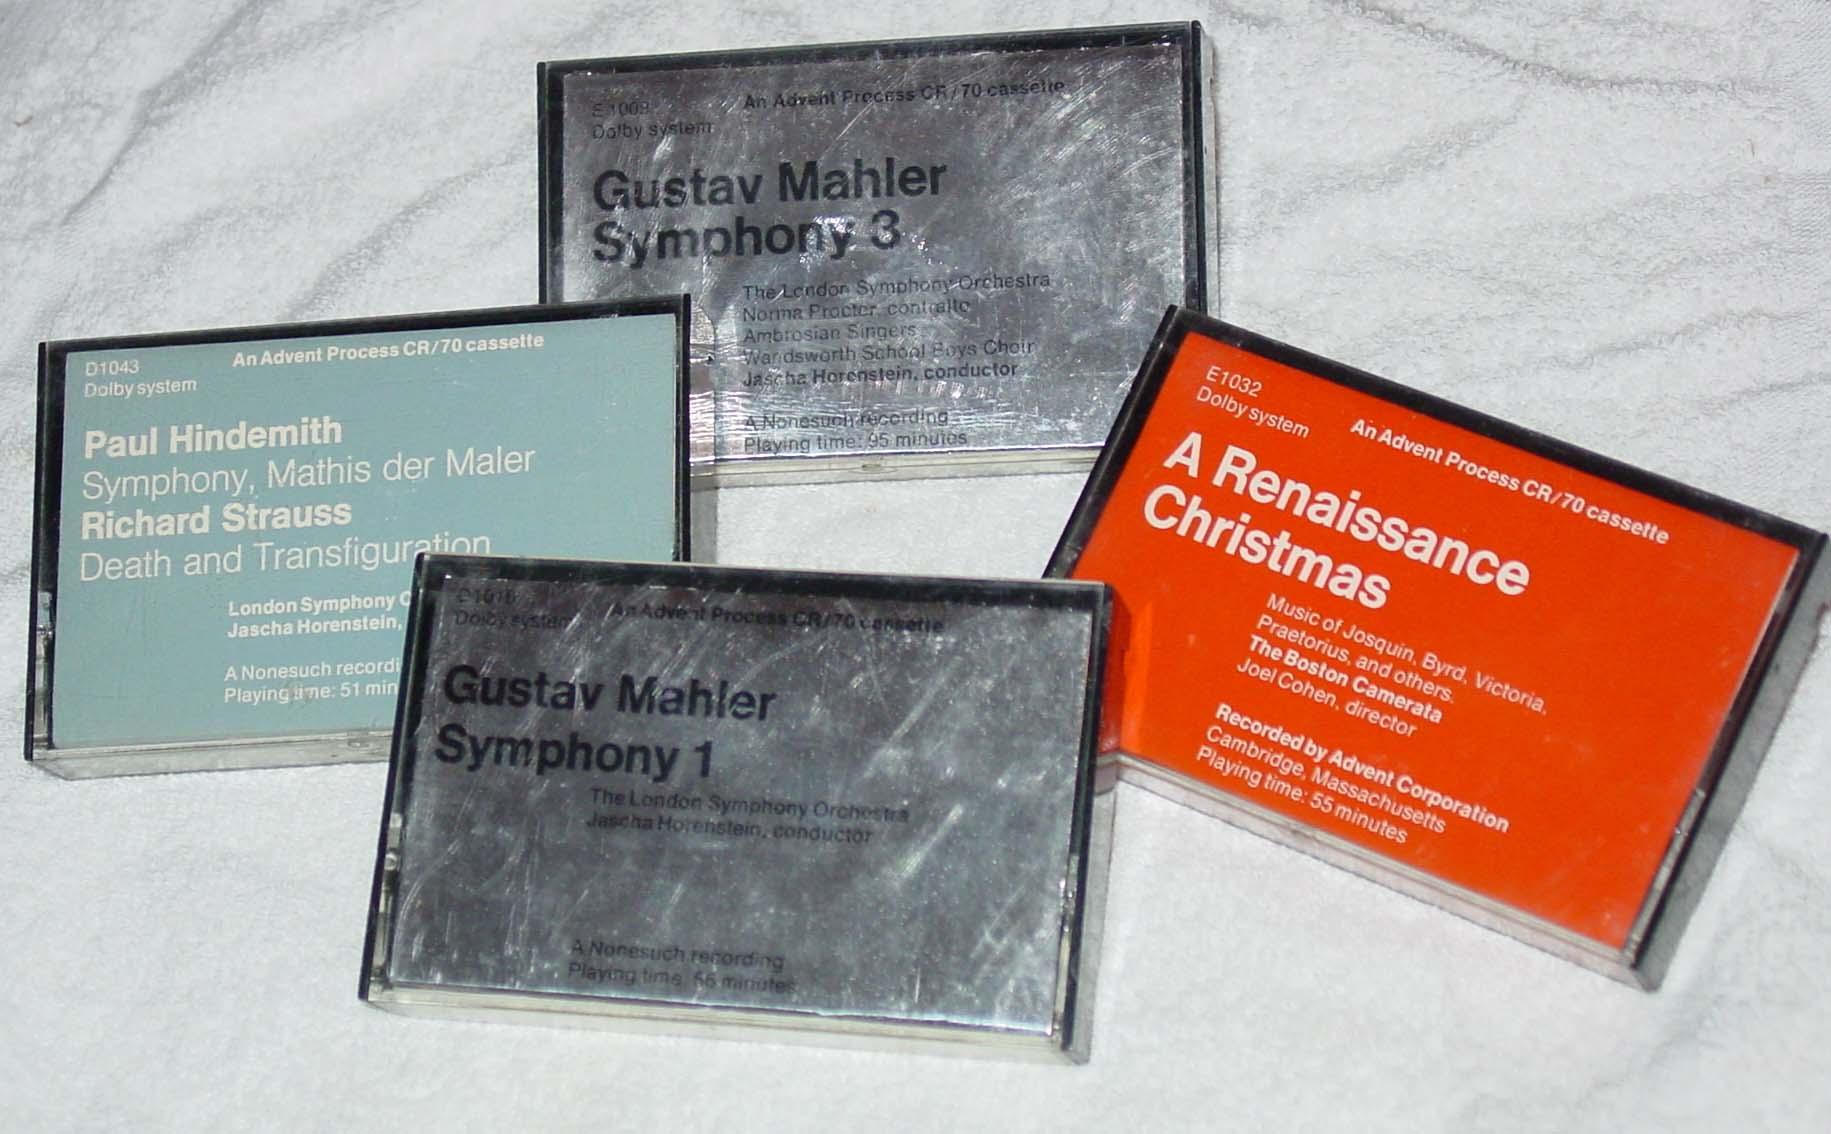 Advent CR80 cassettes